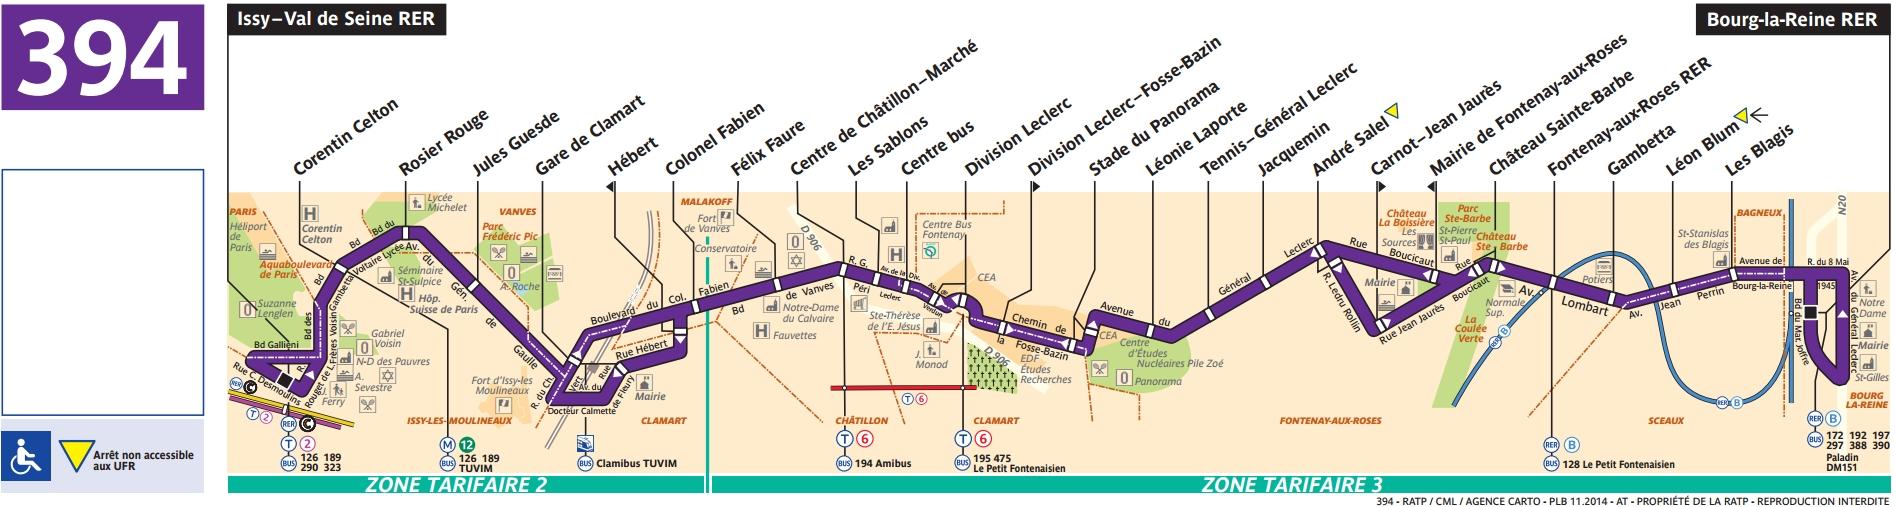 Plan bus Ligne 394